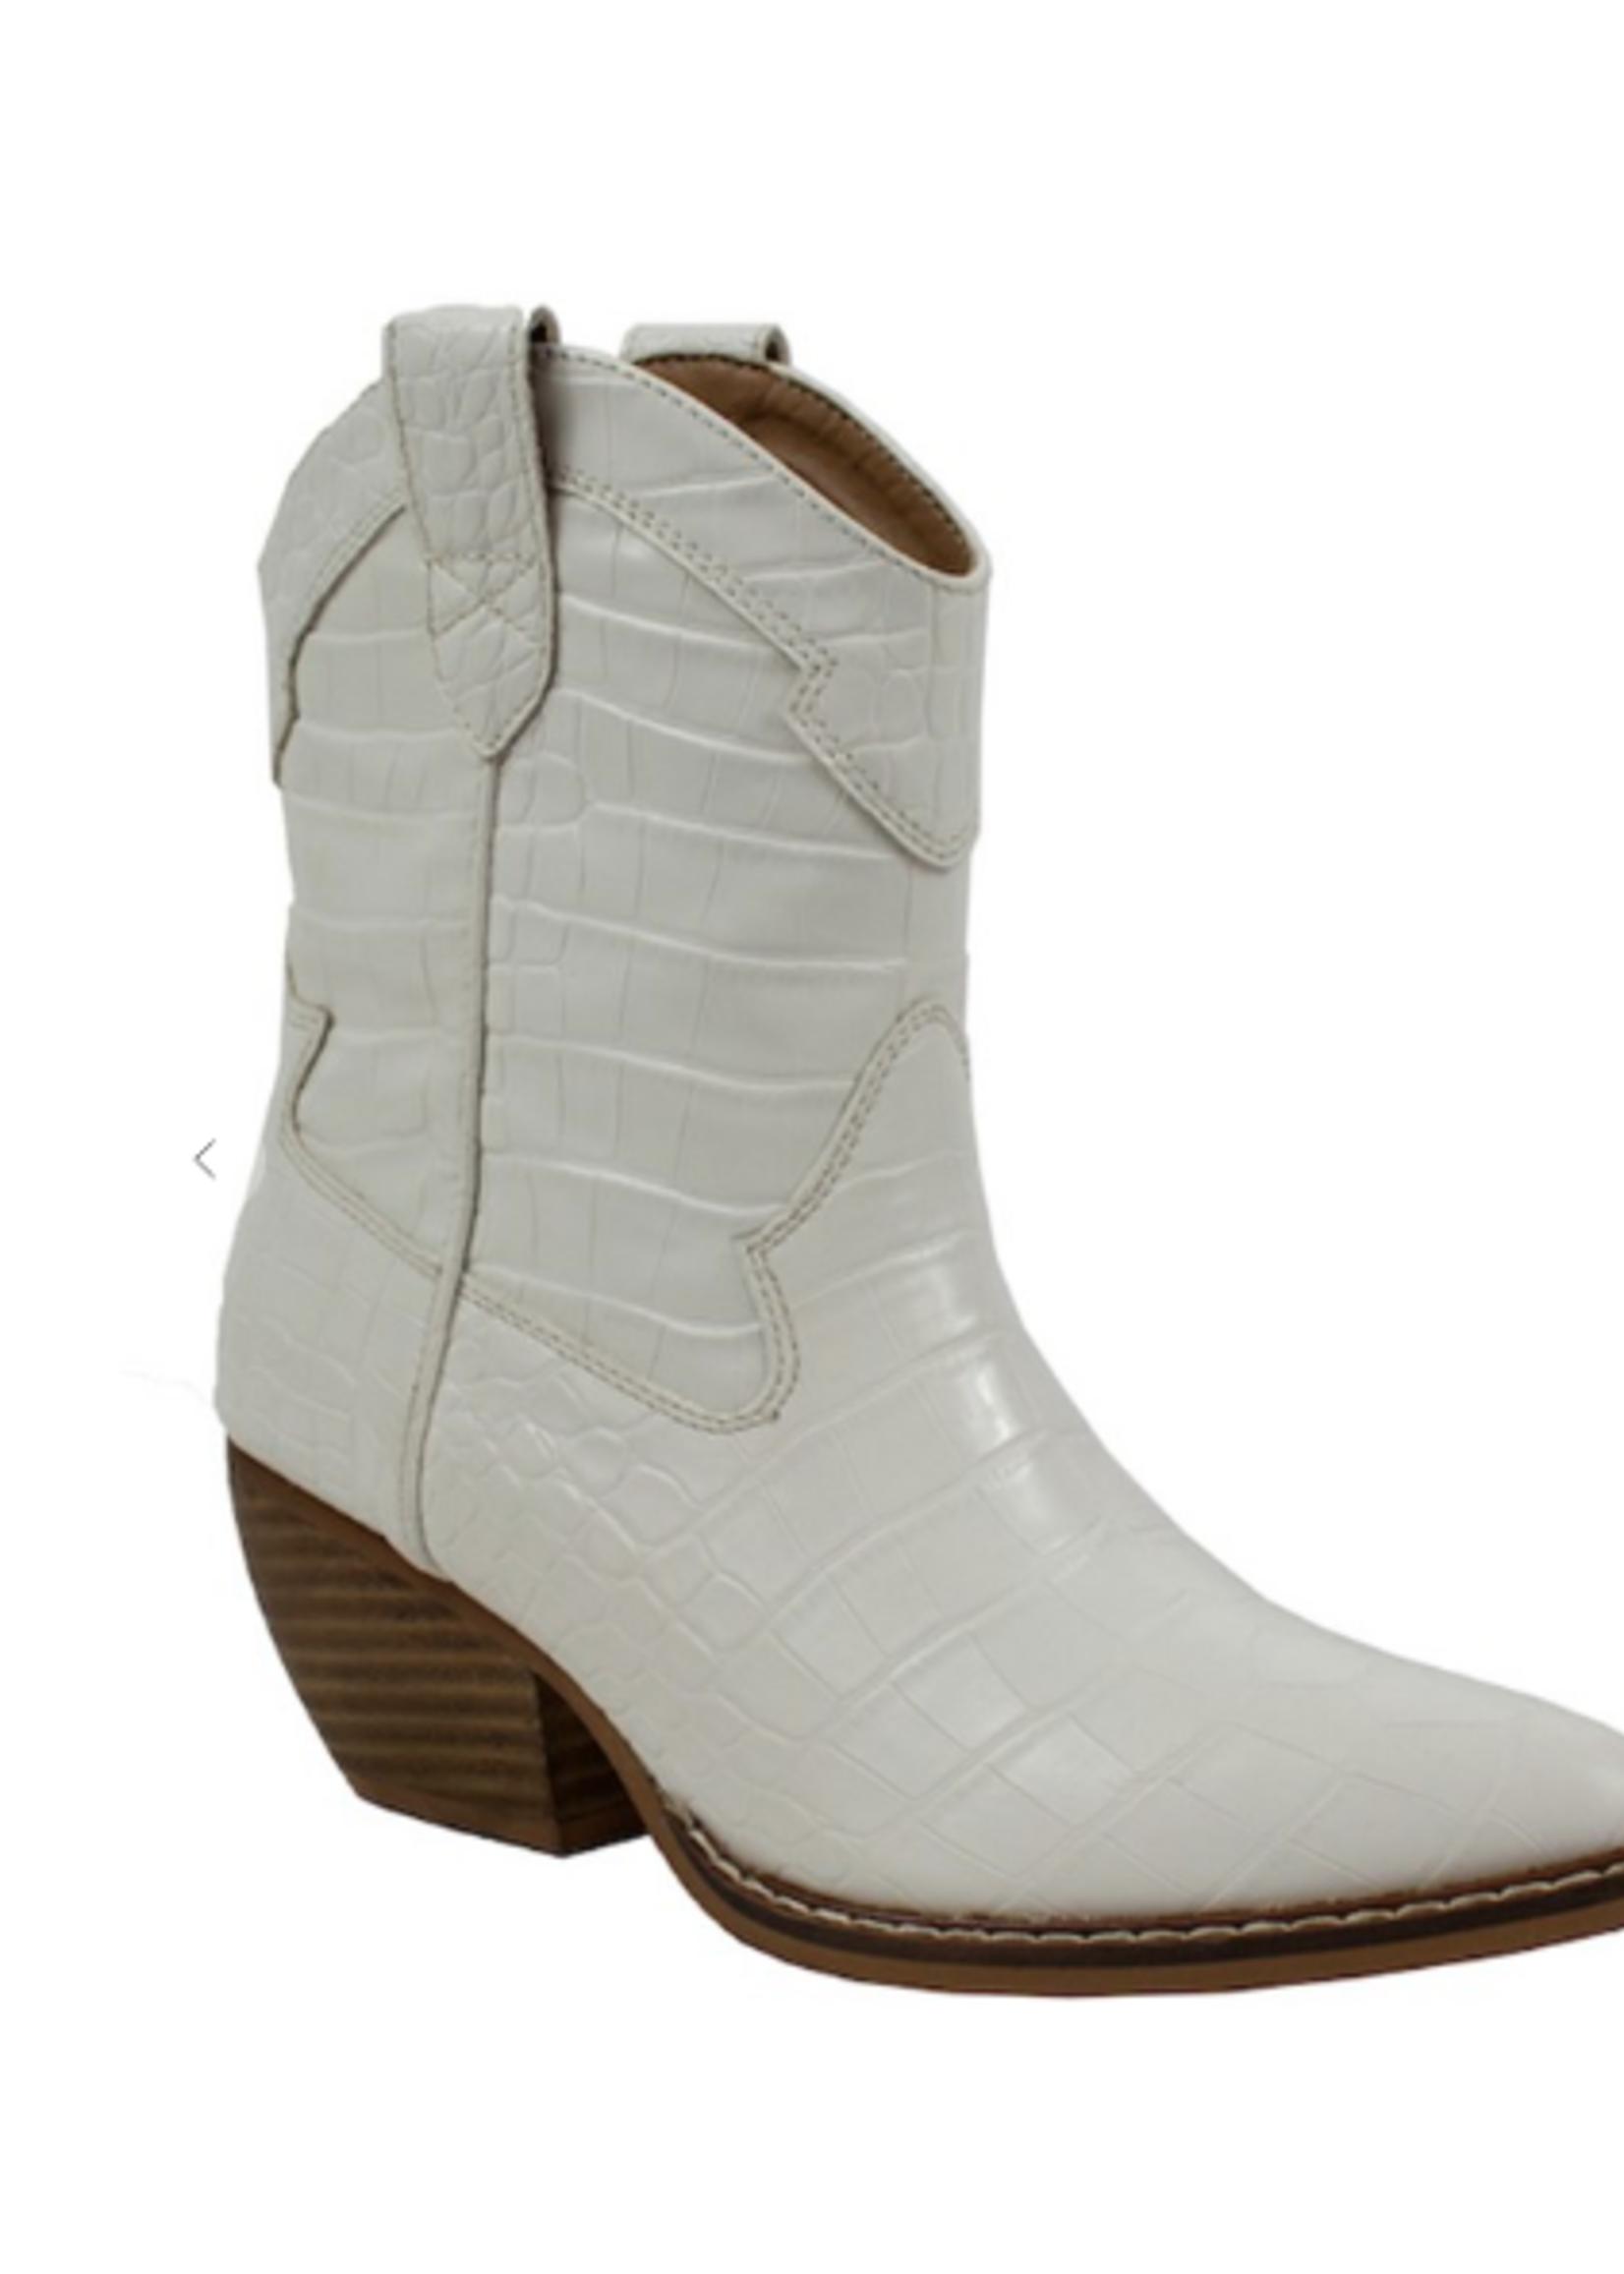 White Western Croc Boots